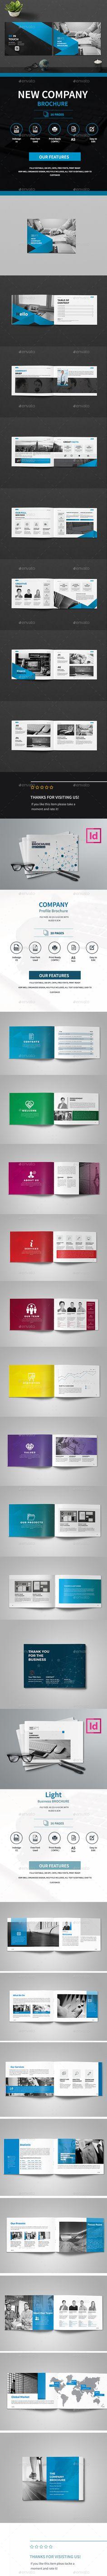 Indd Corporate Business Brochure Bundle - Corporate Brochures Download here : https://graphicriver.net/item/indd-corporate-business-brochure-bundle/19645775?s_rank=103&ref=Al-fatih